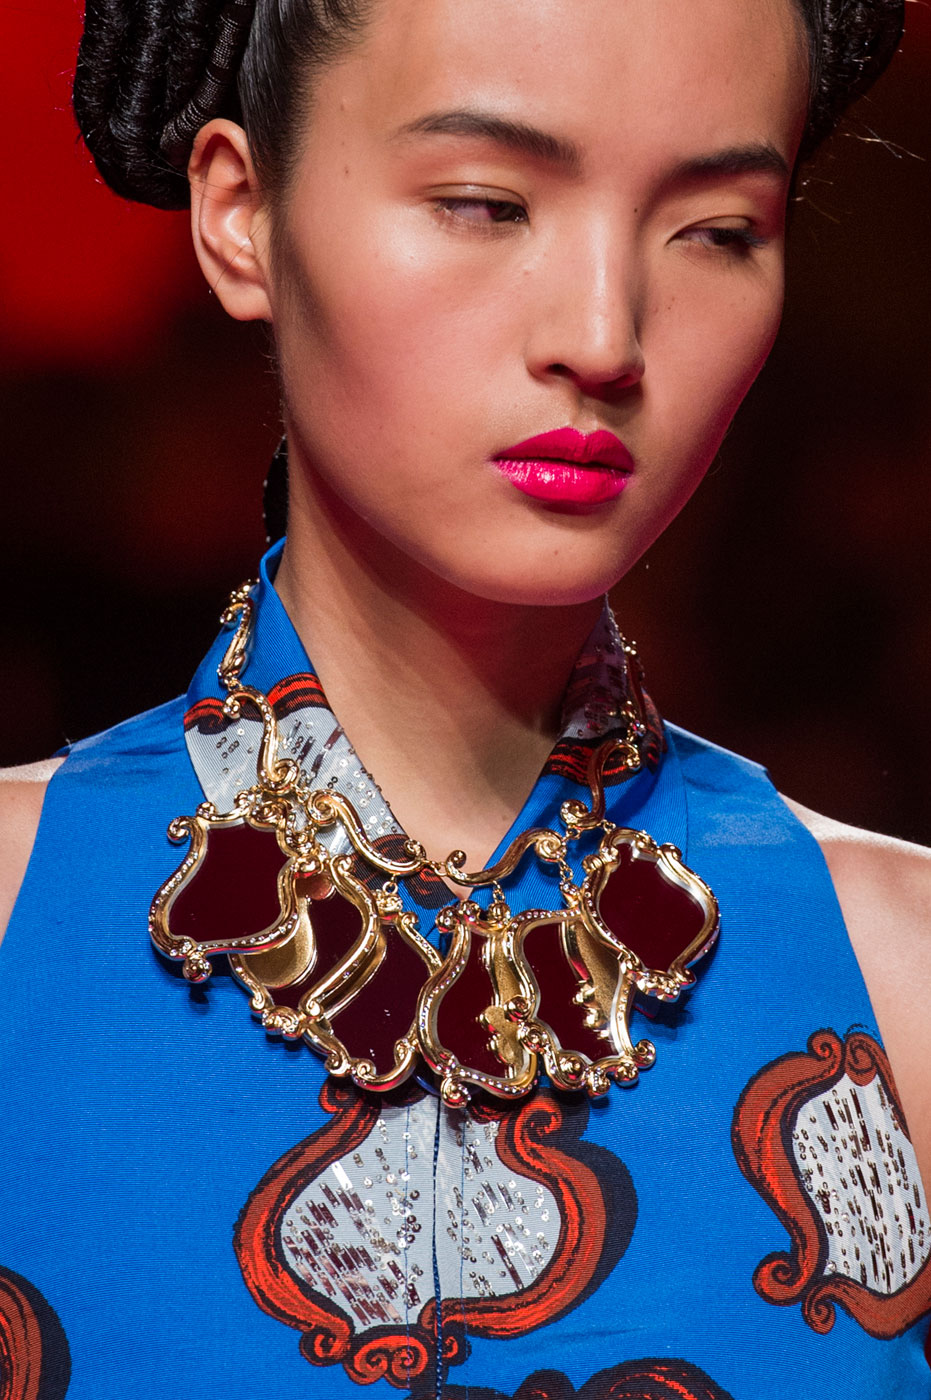 Schiaparelli-fashion-runway-show-close-ups-haute-couture-paris-spring-summer-2015-the-impression-42